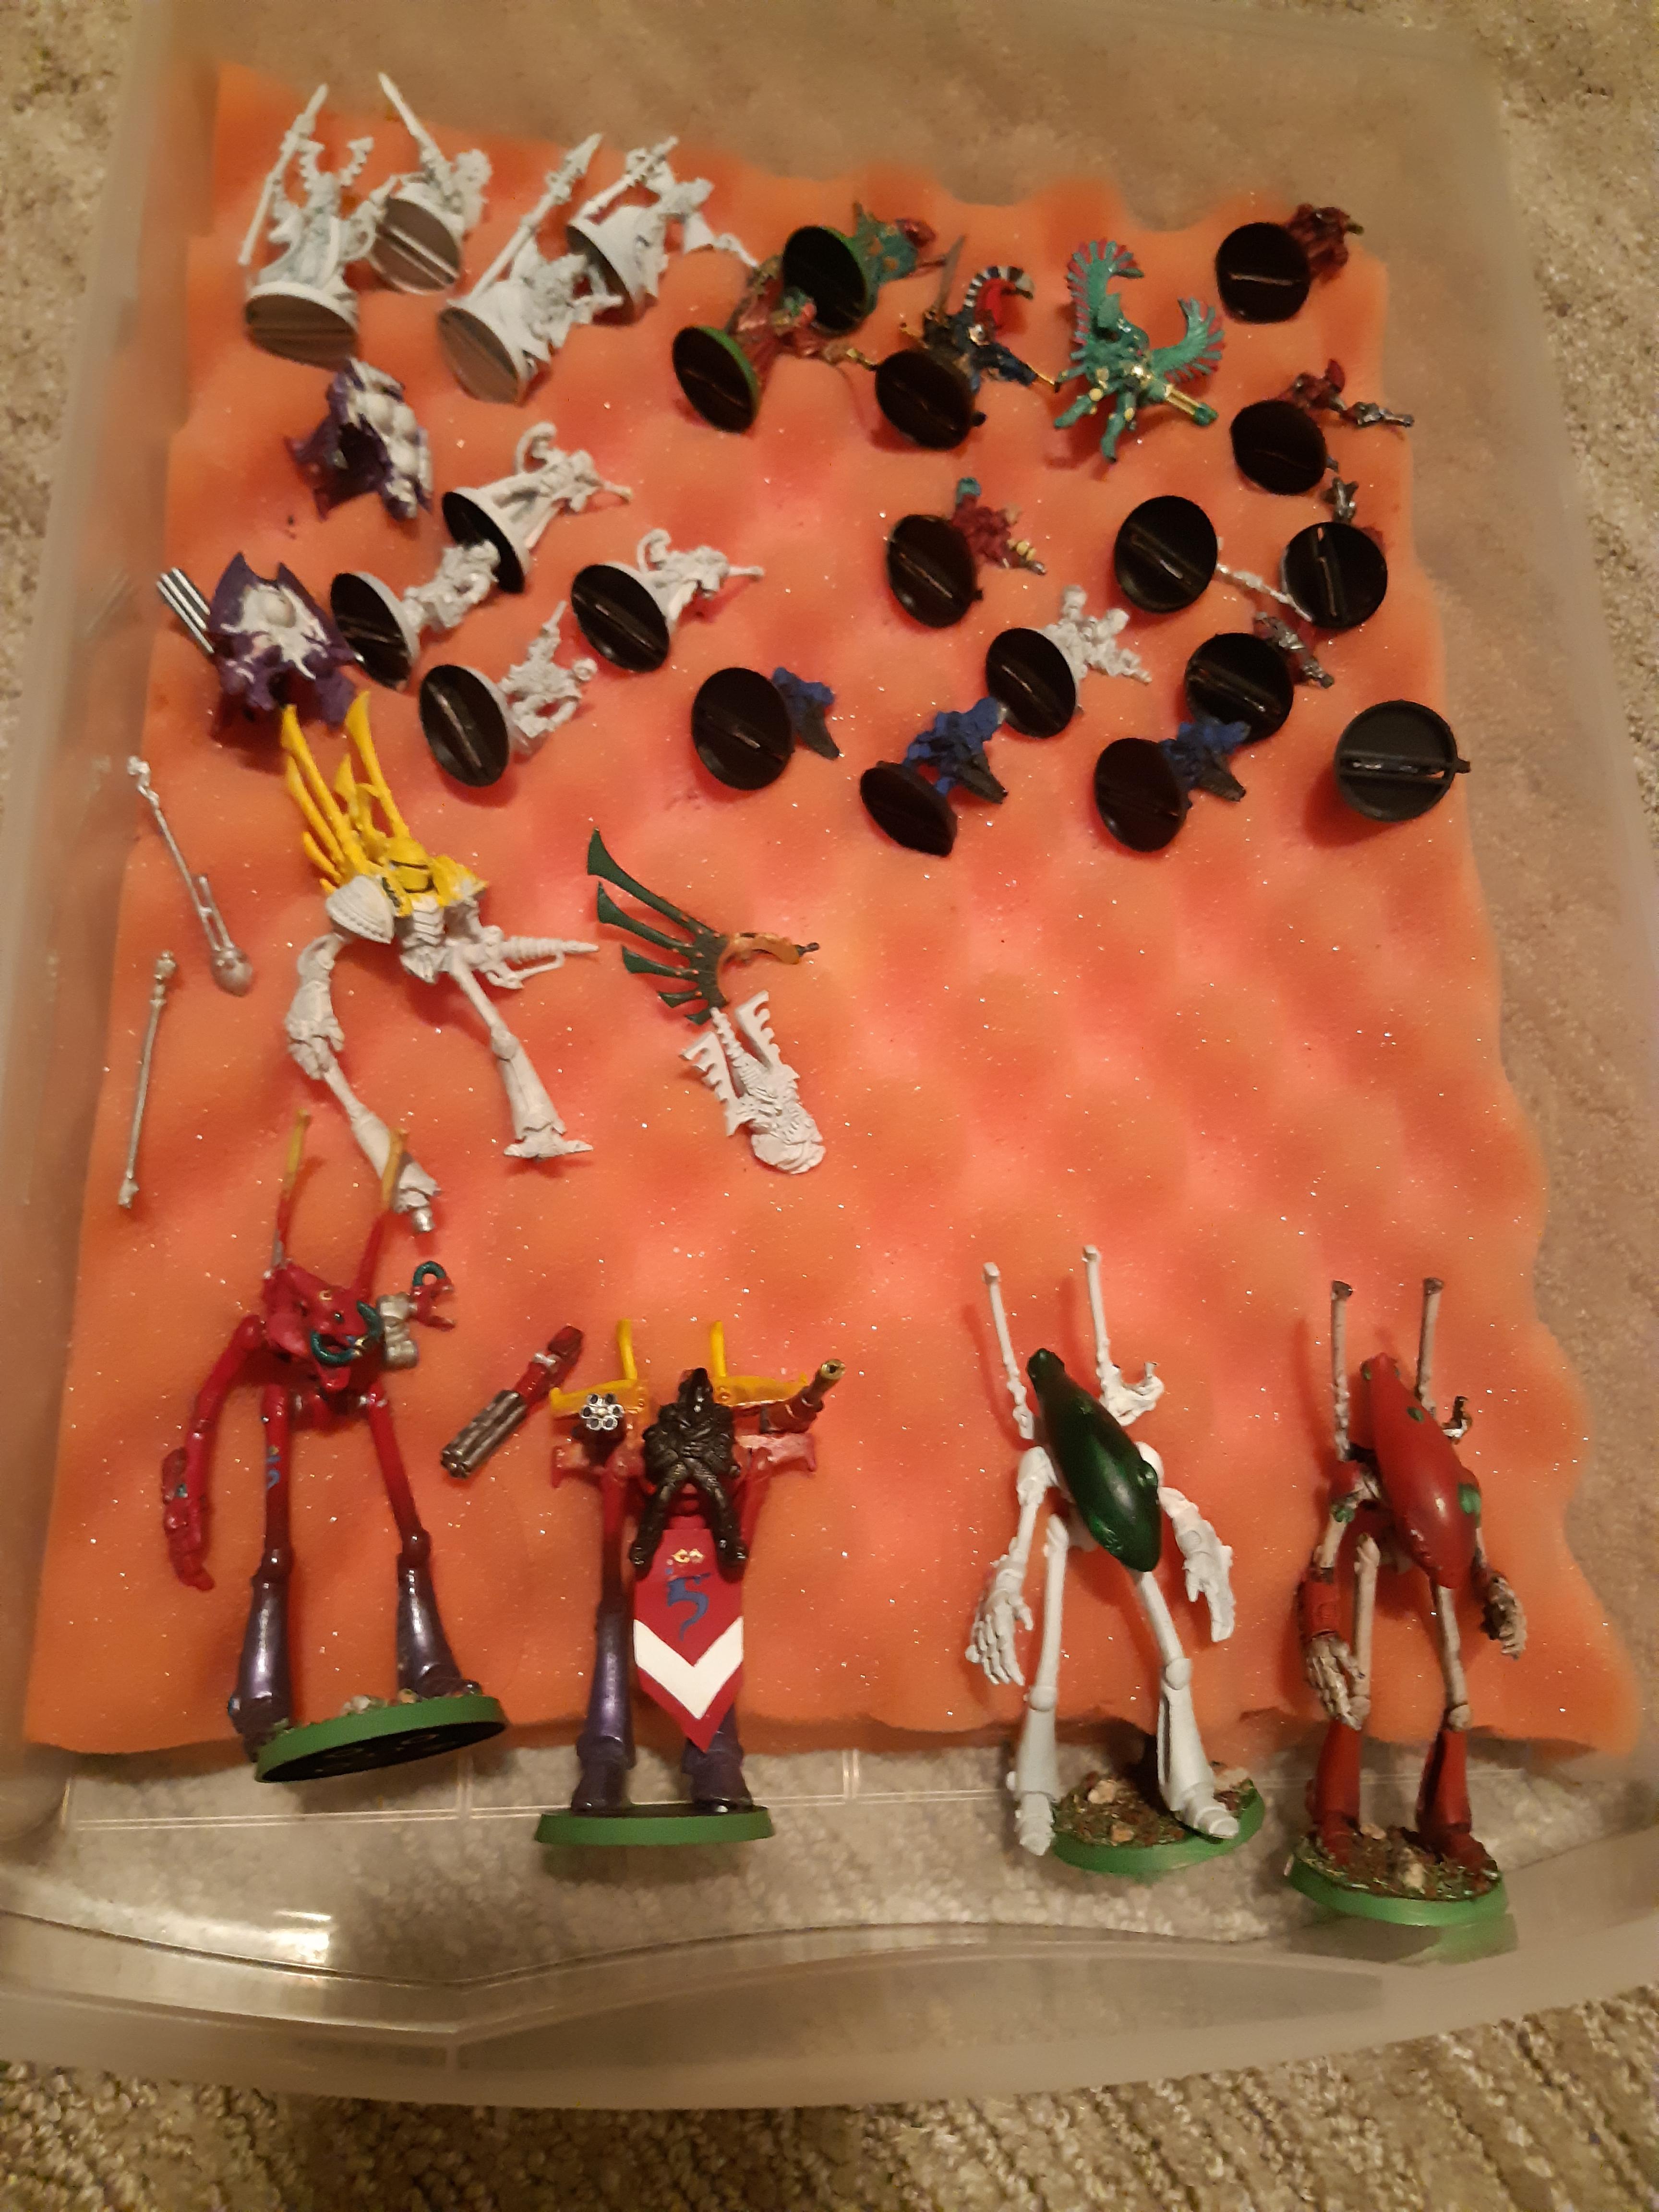 Eldar, Metal, Pewter, Plastic, Rogue Trader, Saim-hann, Warhammer 40,000